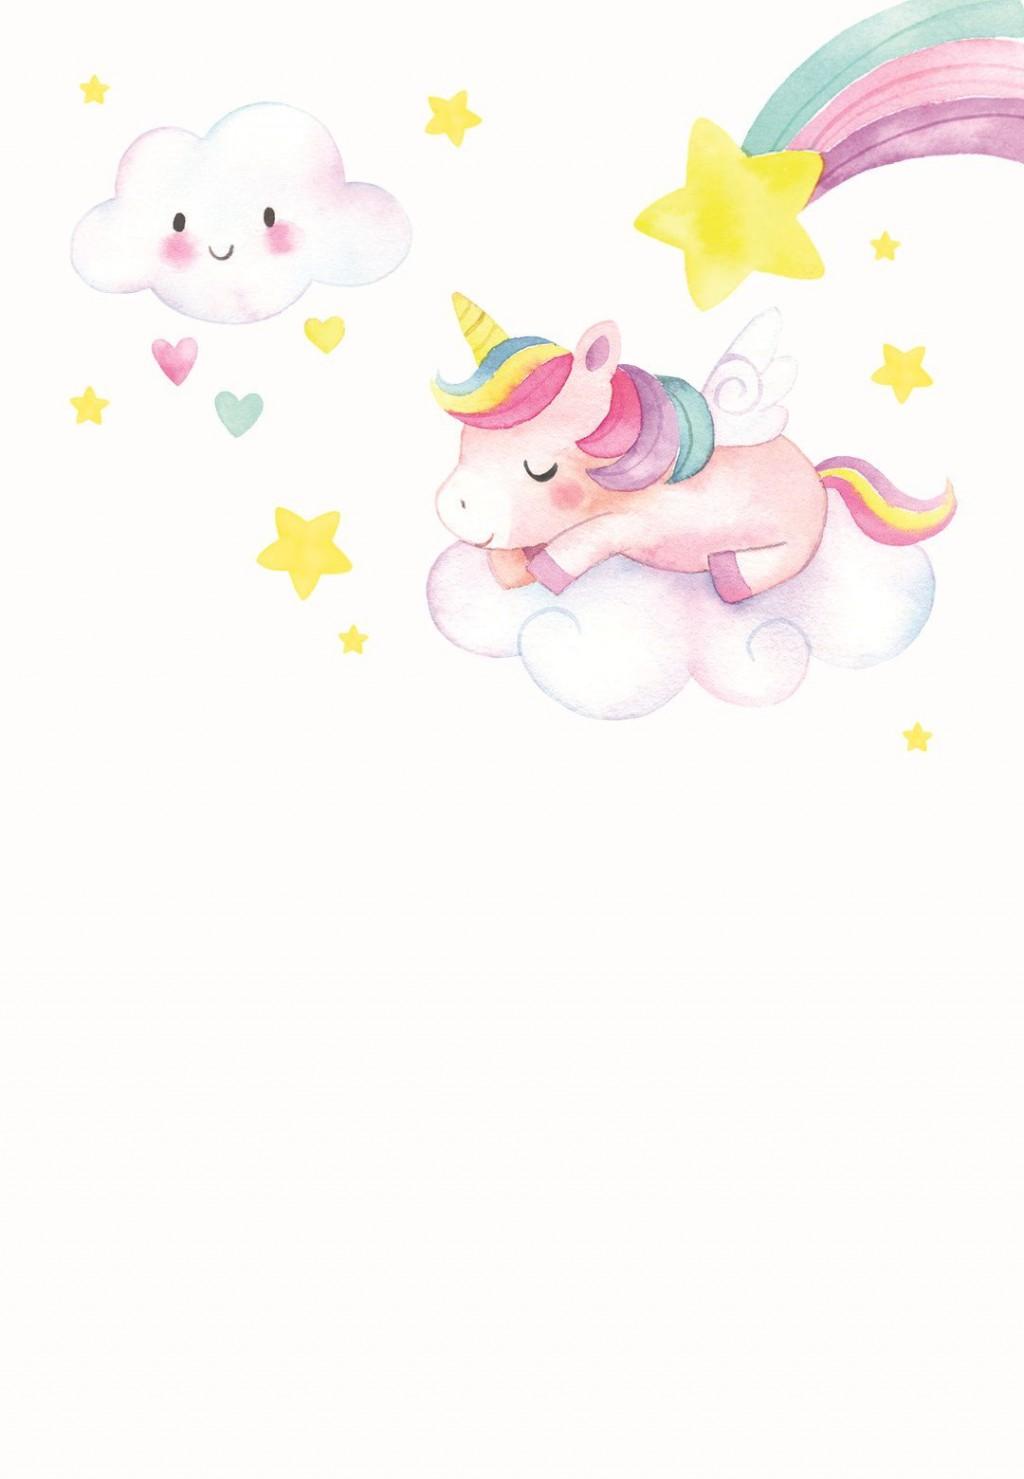 000 Imposing Unicorn Baby Shower Template Free Download Photo  Printable InvitationLarge